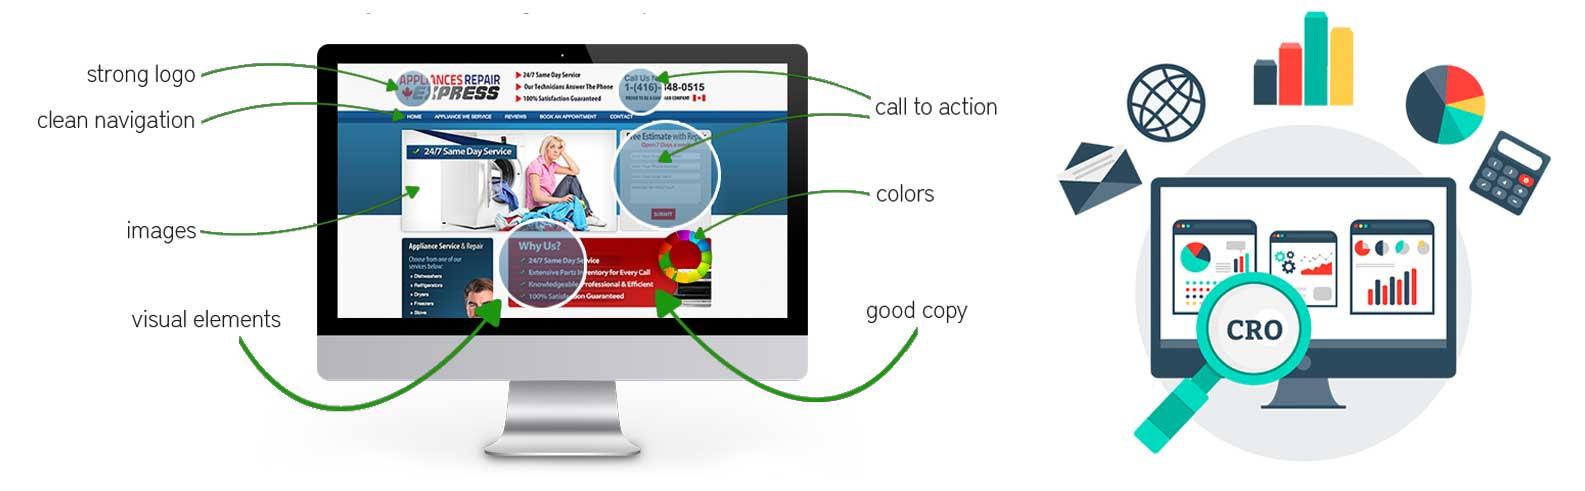 website-conversion-optimization-CRO